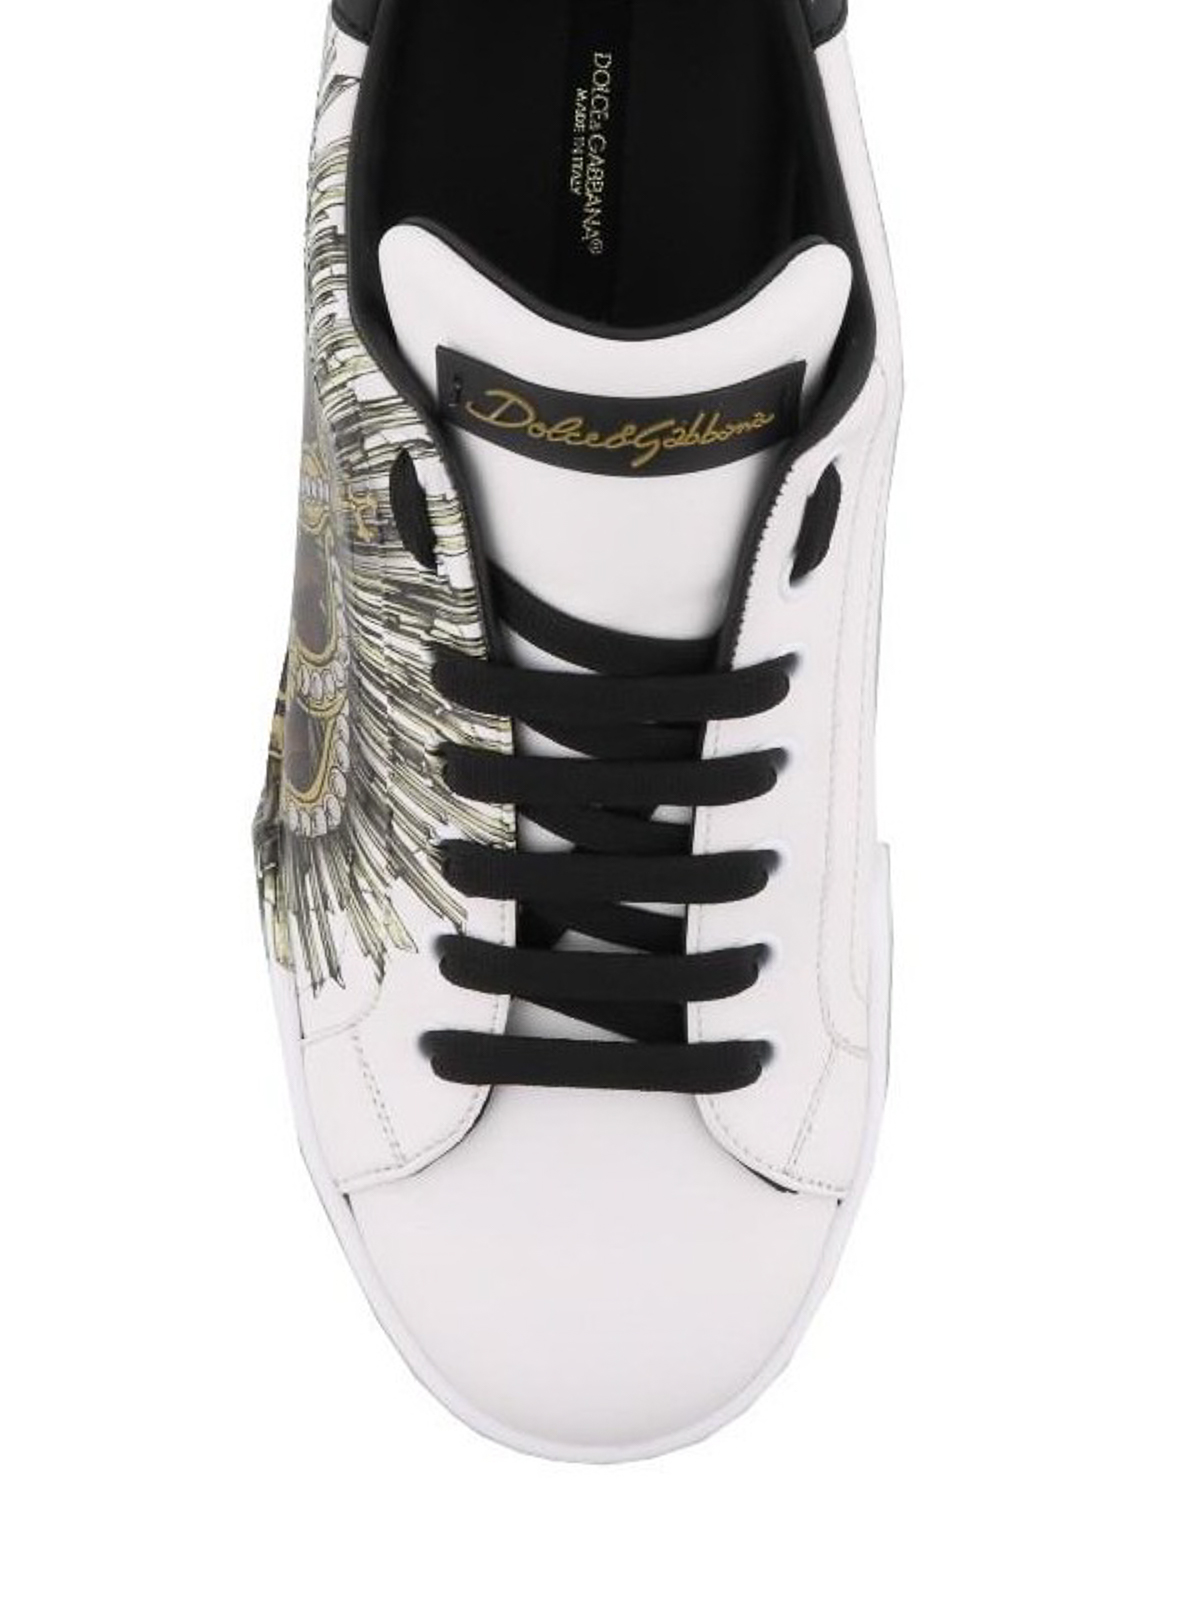 iKRIX DOLCE   GABBANA  trainers - Crown print Portofino sneakers 32837c876c6